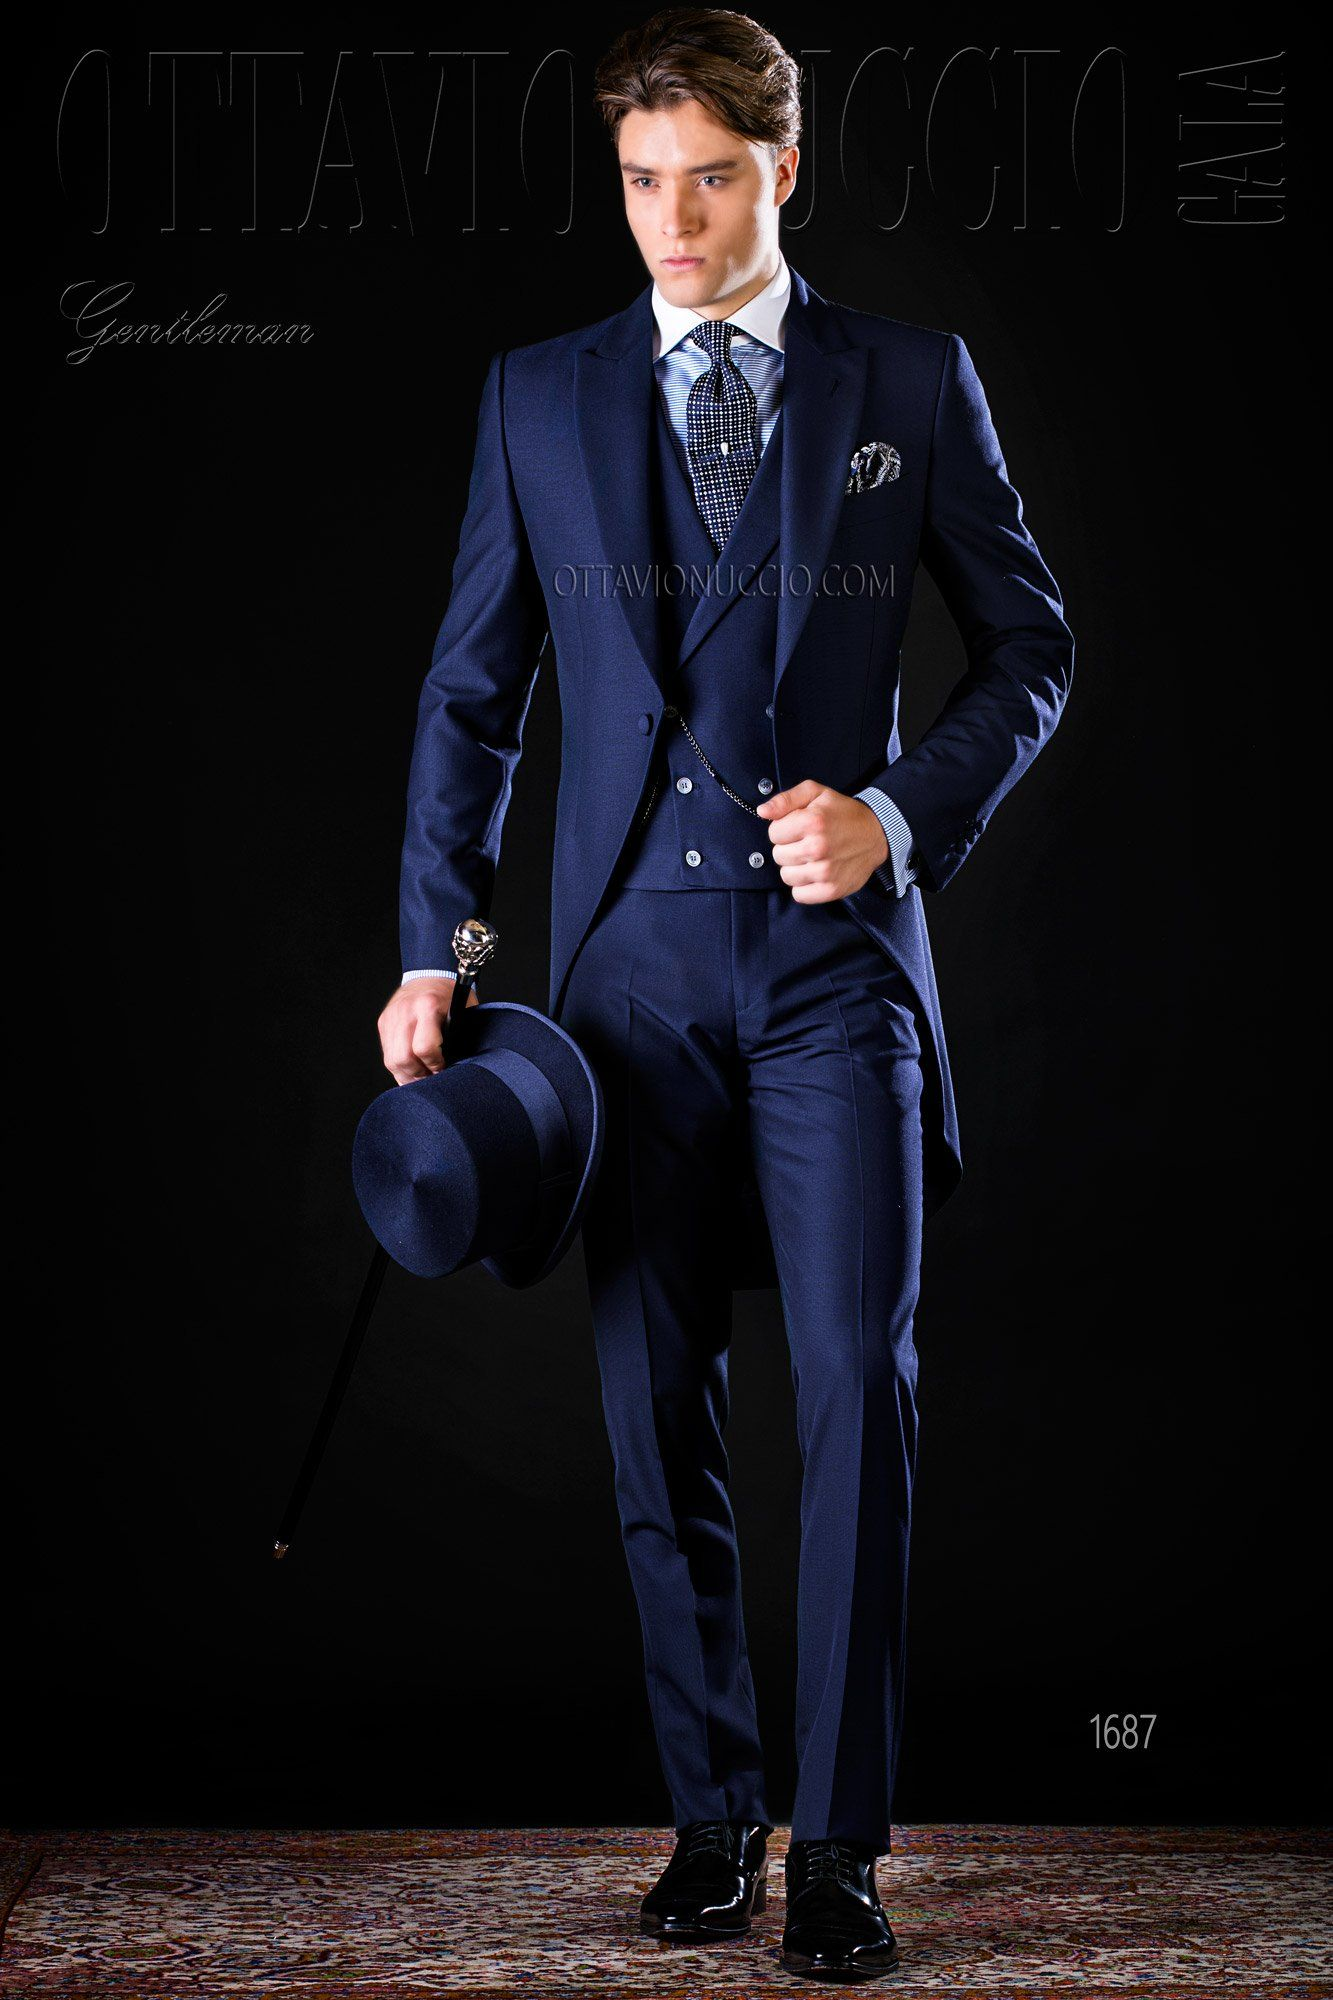 Midnight Blue Long Tail Suit Morningcoat Groom Wedding Tuxedo Luxury Mesnwear